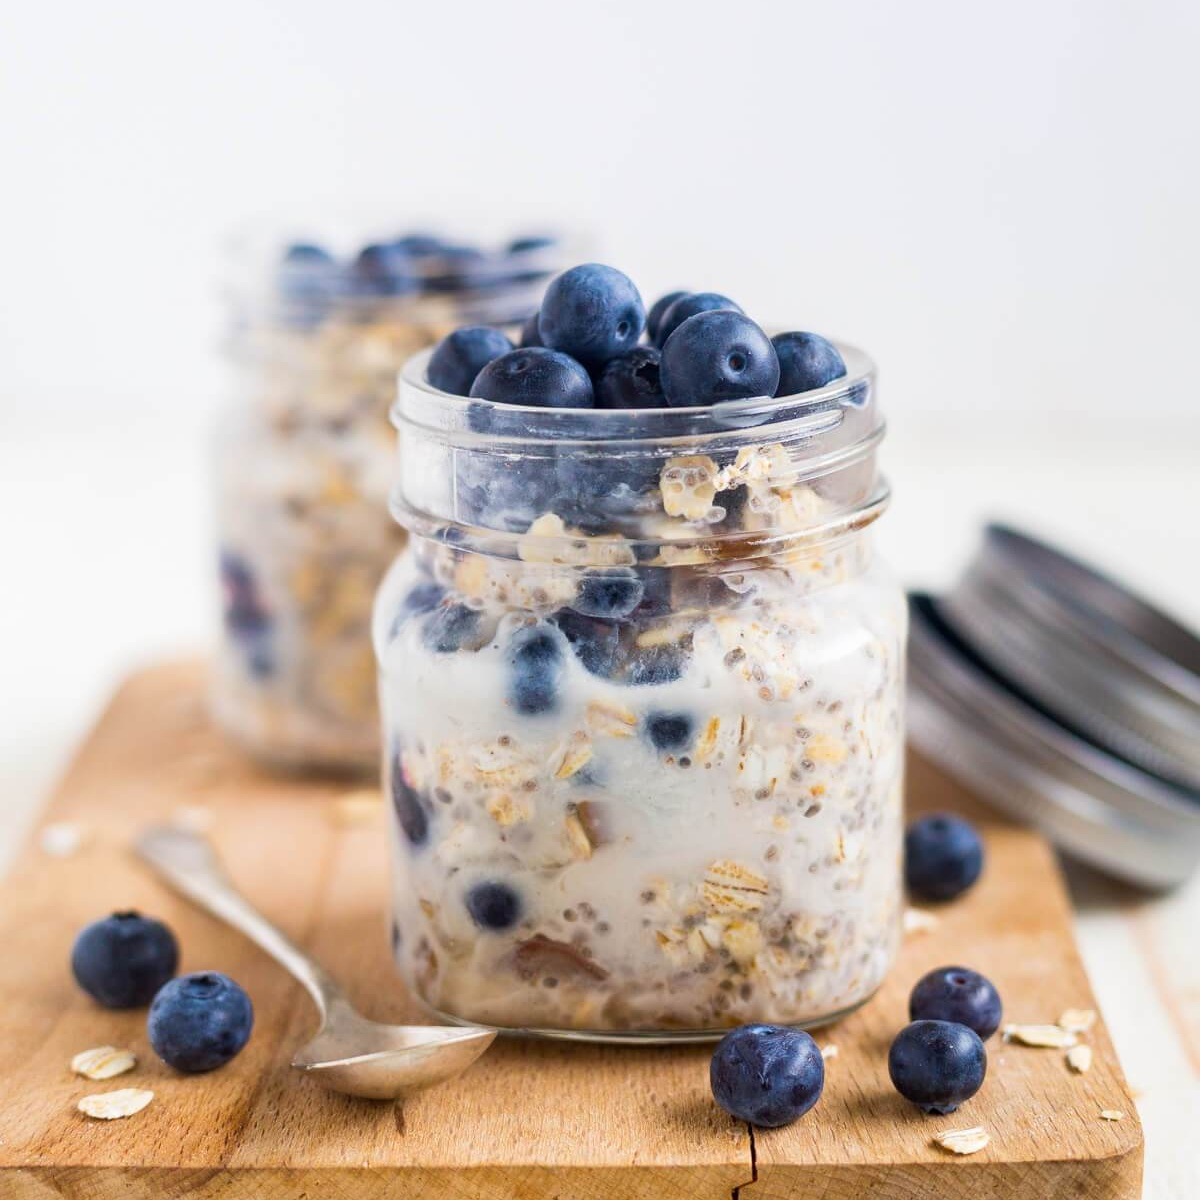 blueberry-overnight-oats-11.jpg